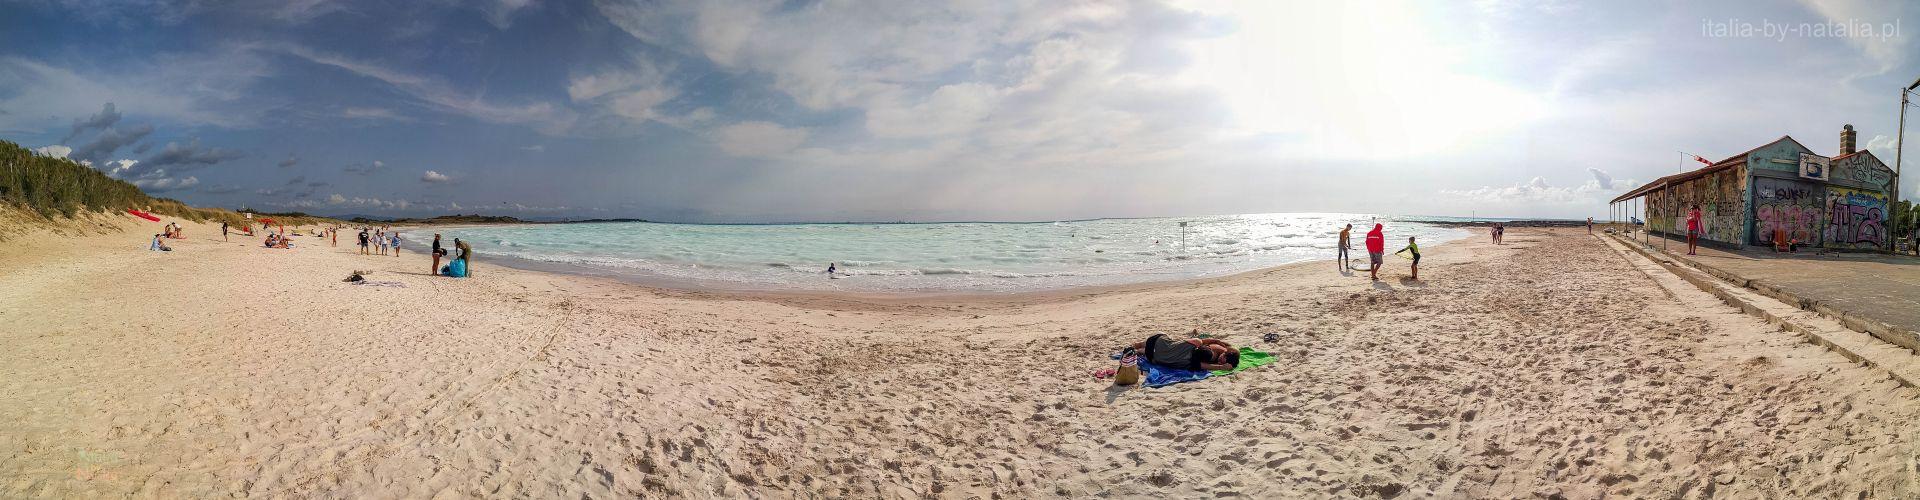 białe plaże Toskania Rosignano Solvay Vada